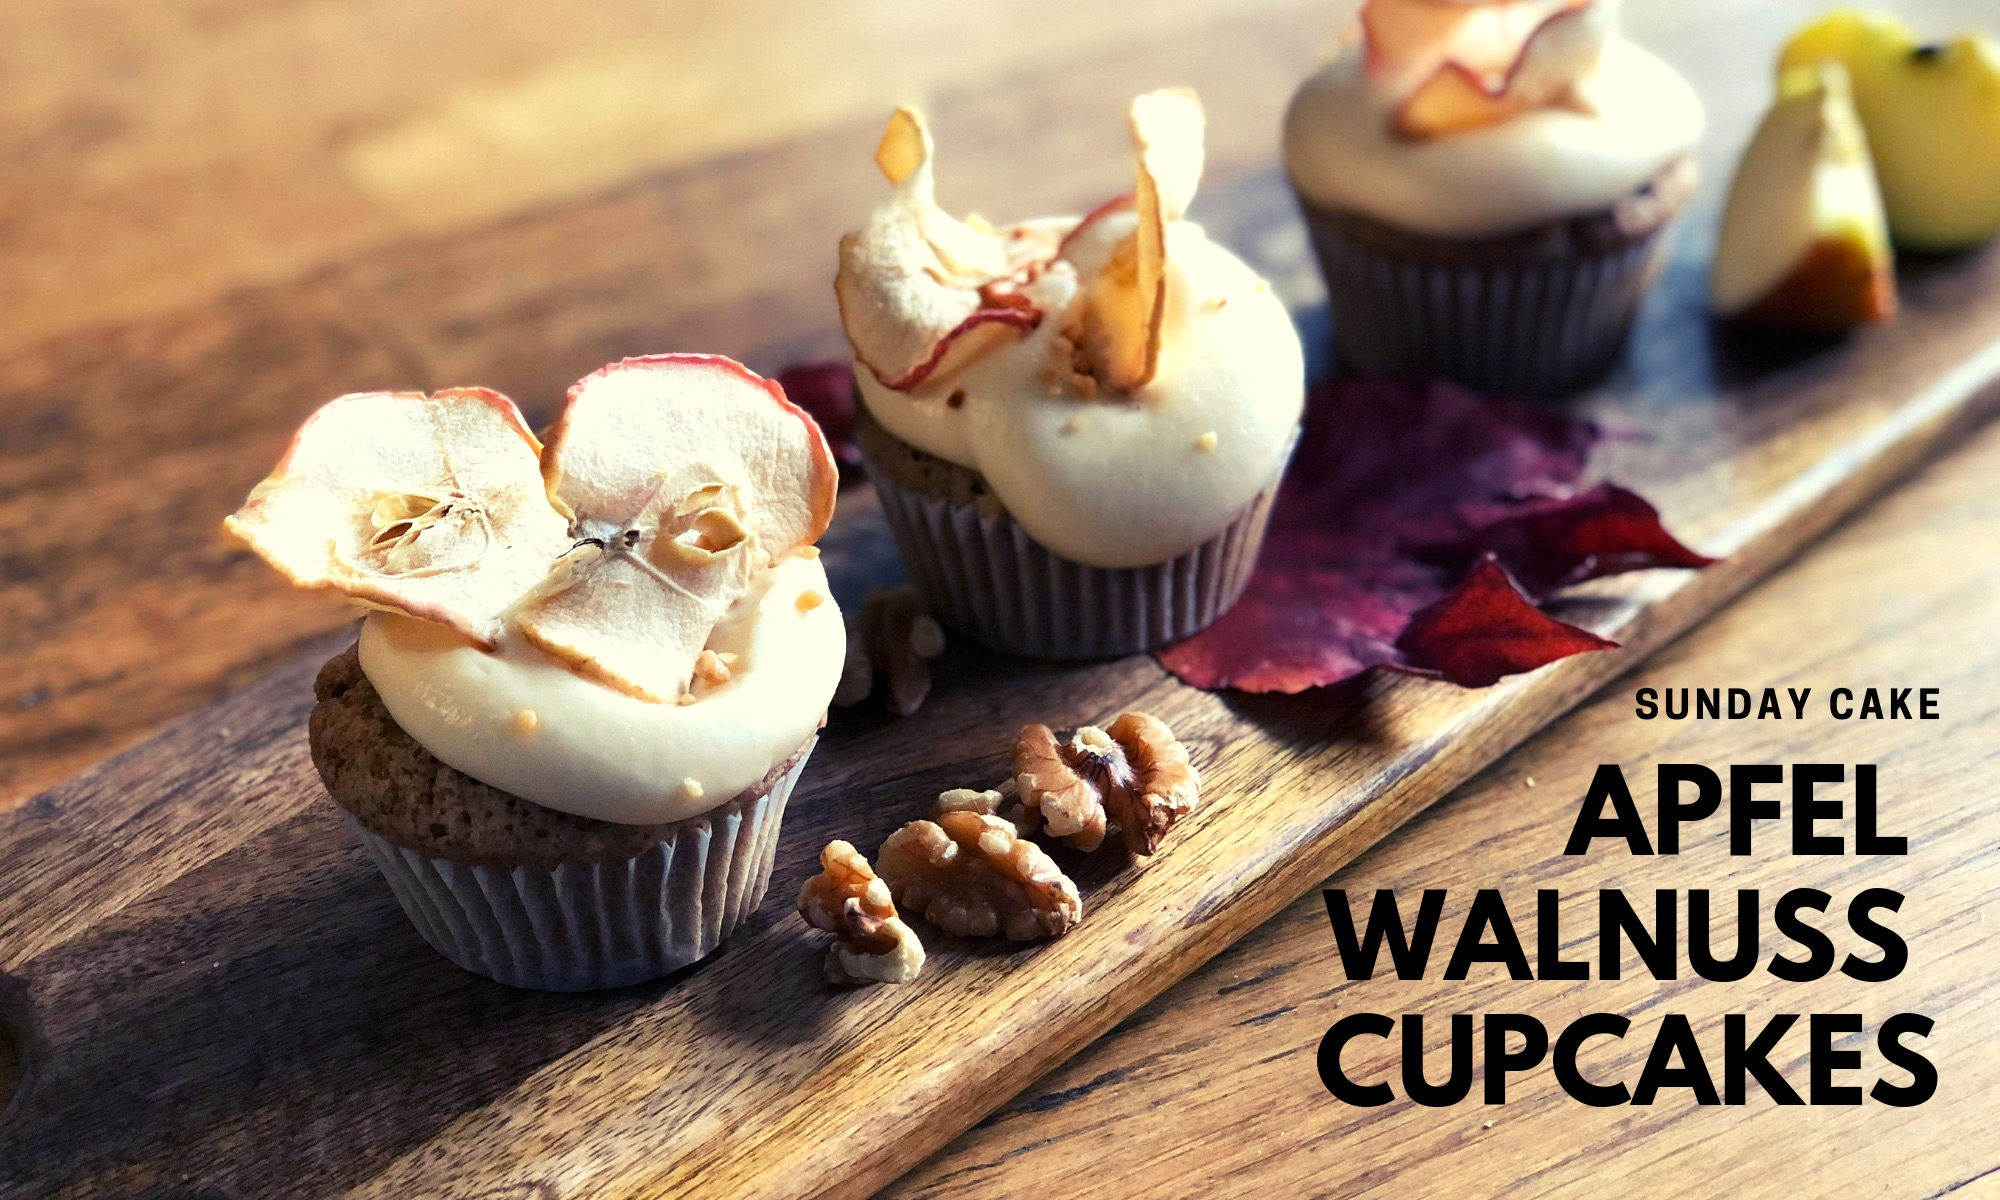 Apfel-Walnuss-Cupcakes